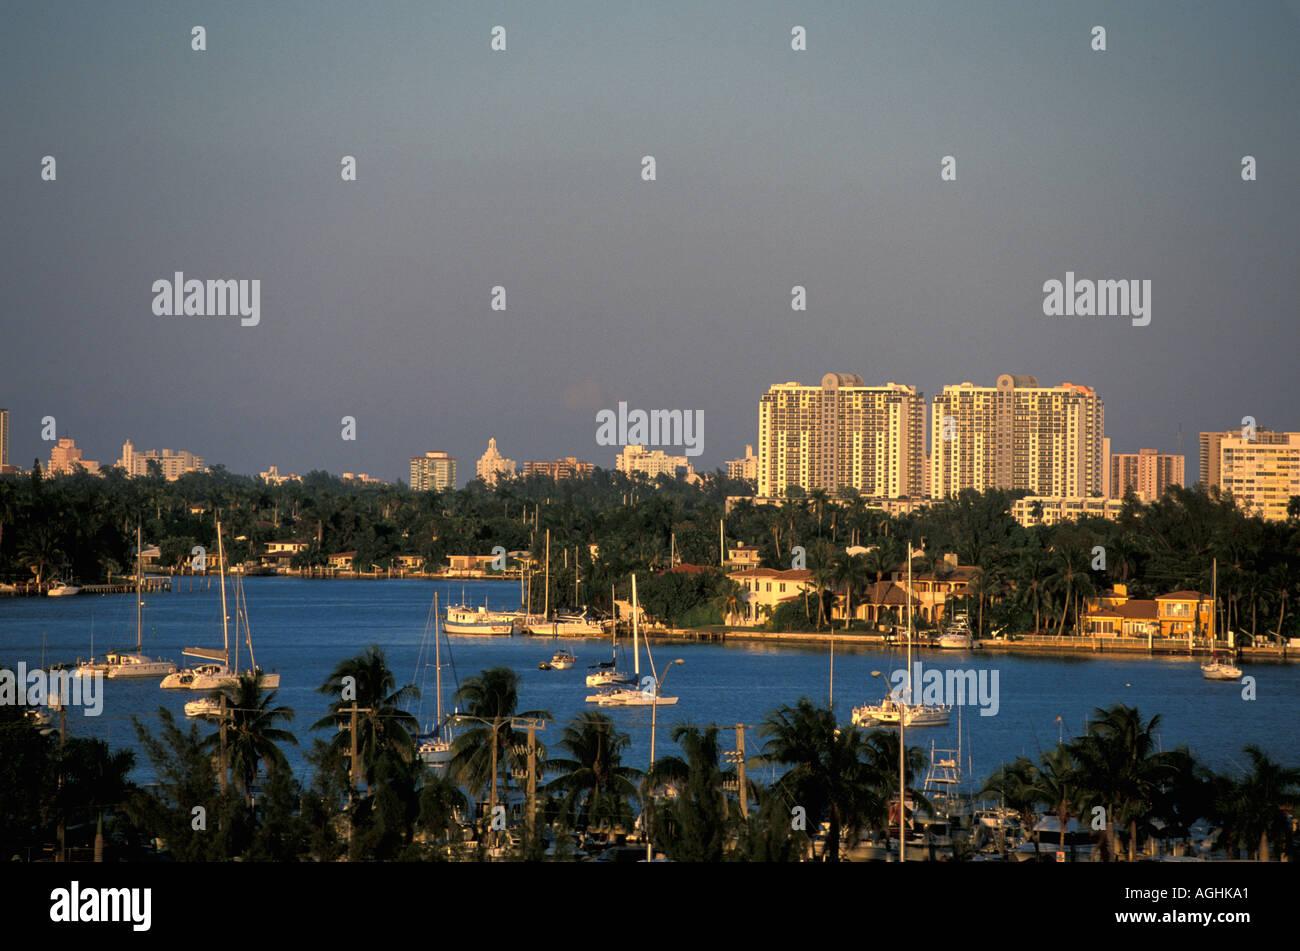 Miami Beach Florida FL sailboats coconut palm trees horizontal late afternoon - Stock Image